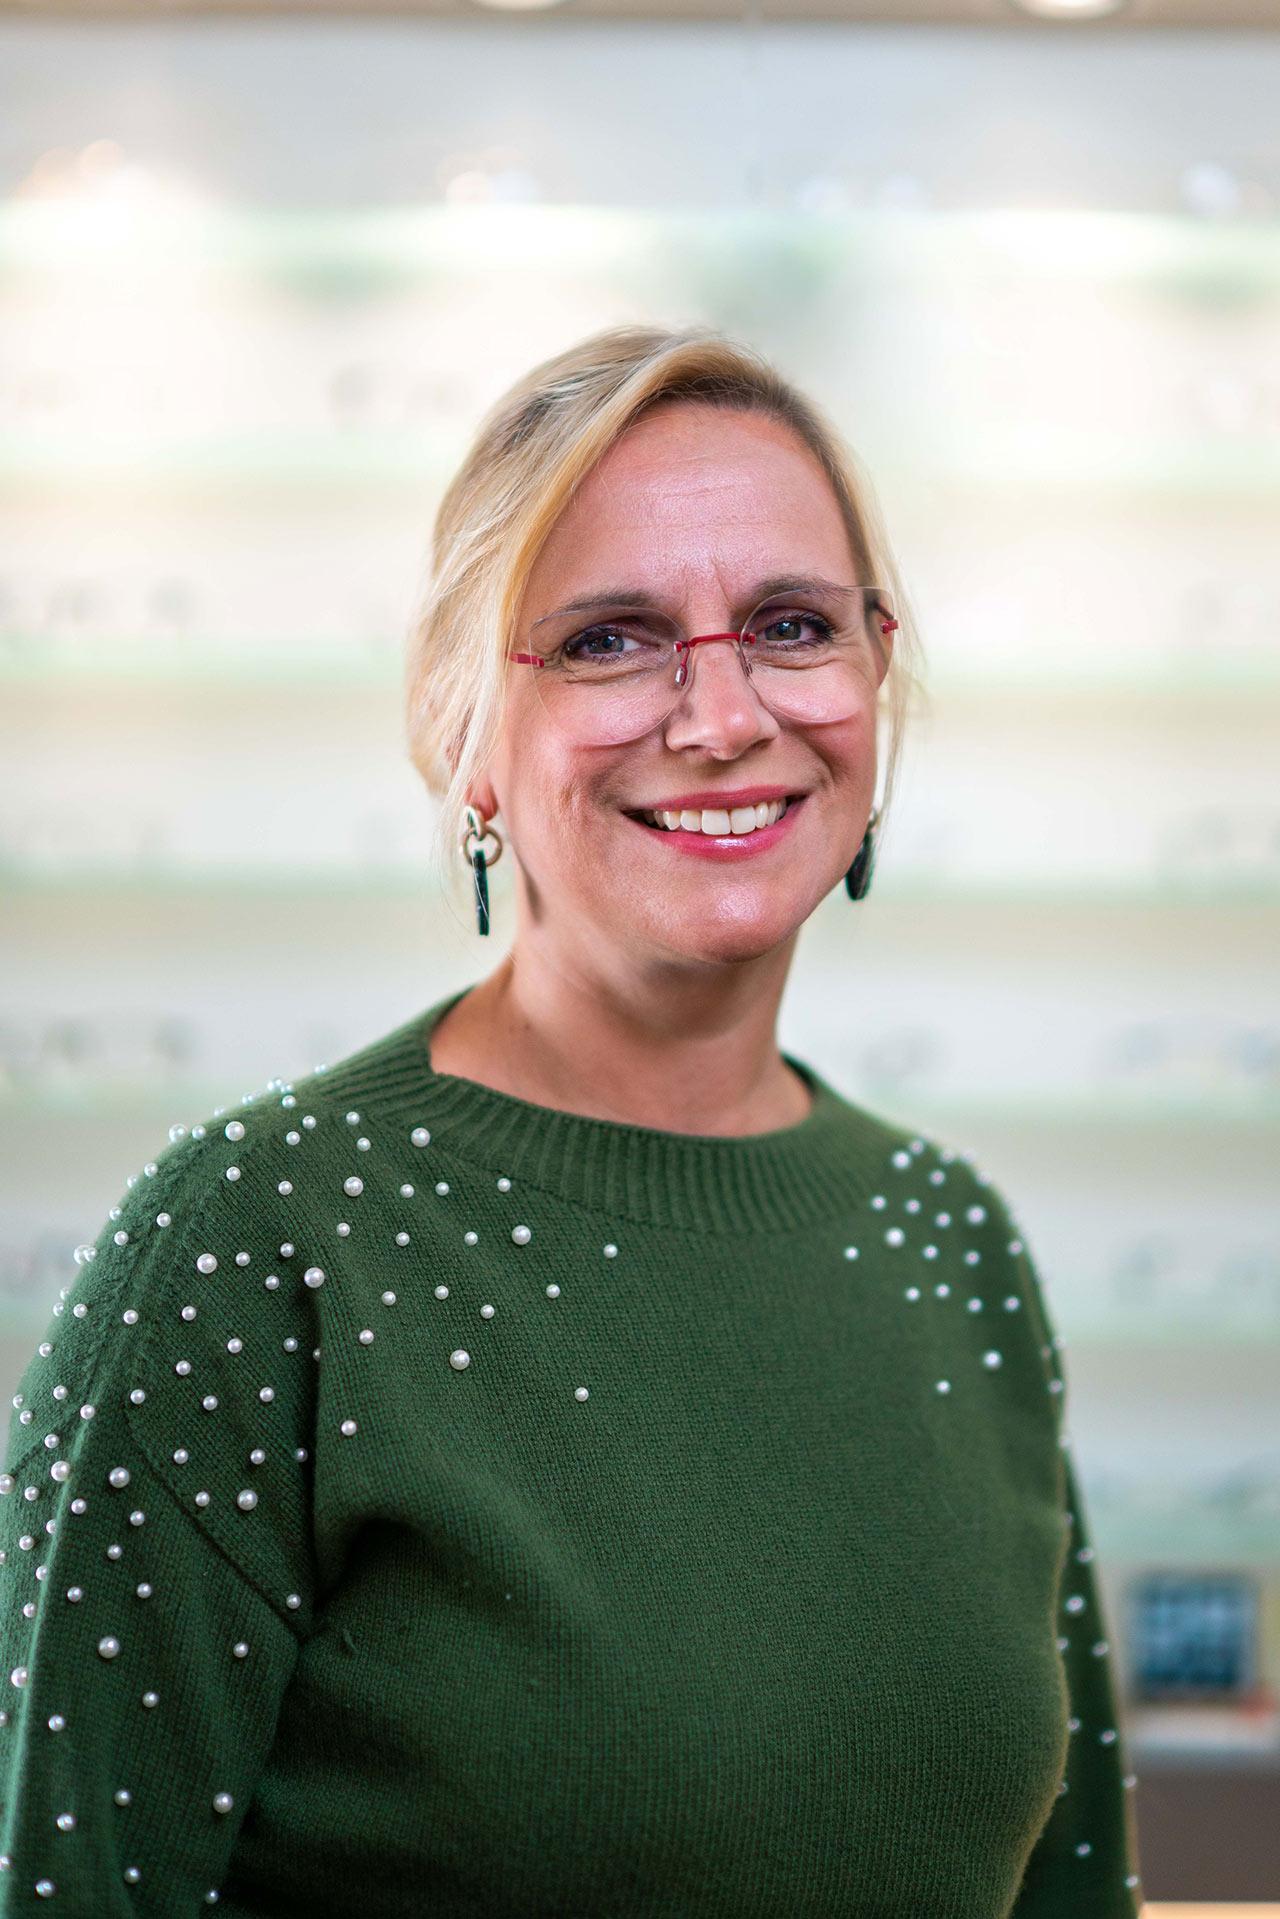 Christine Boer